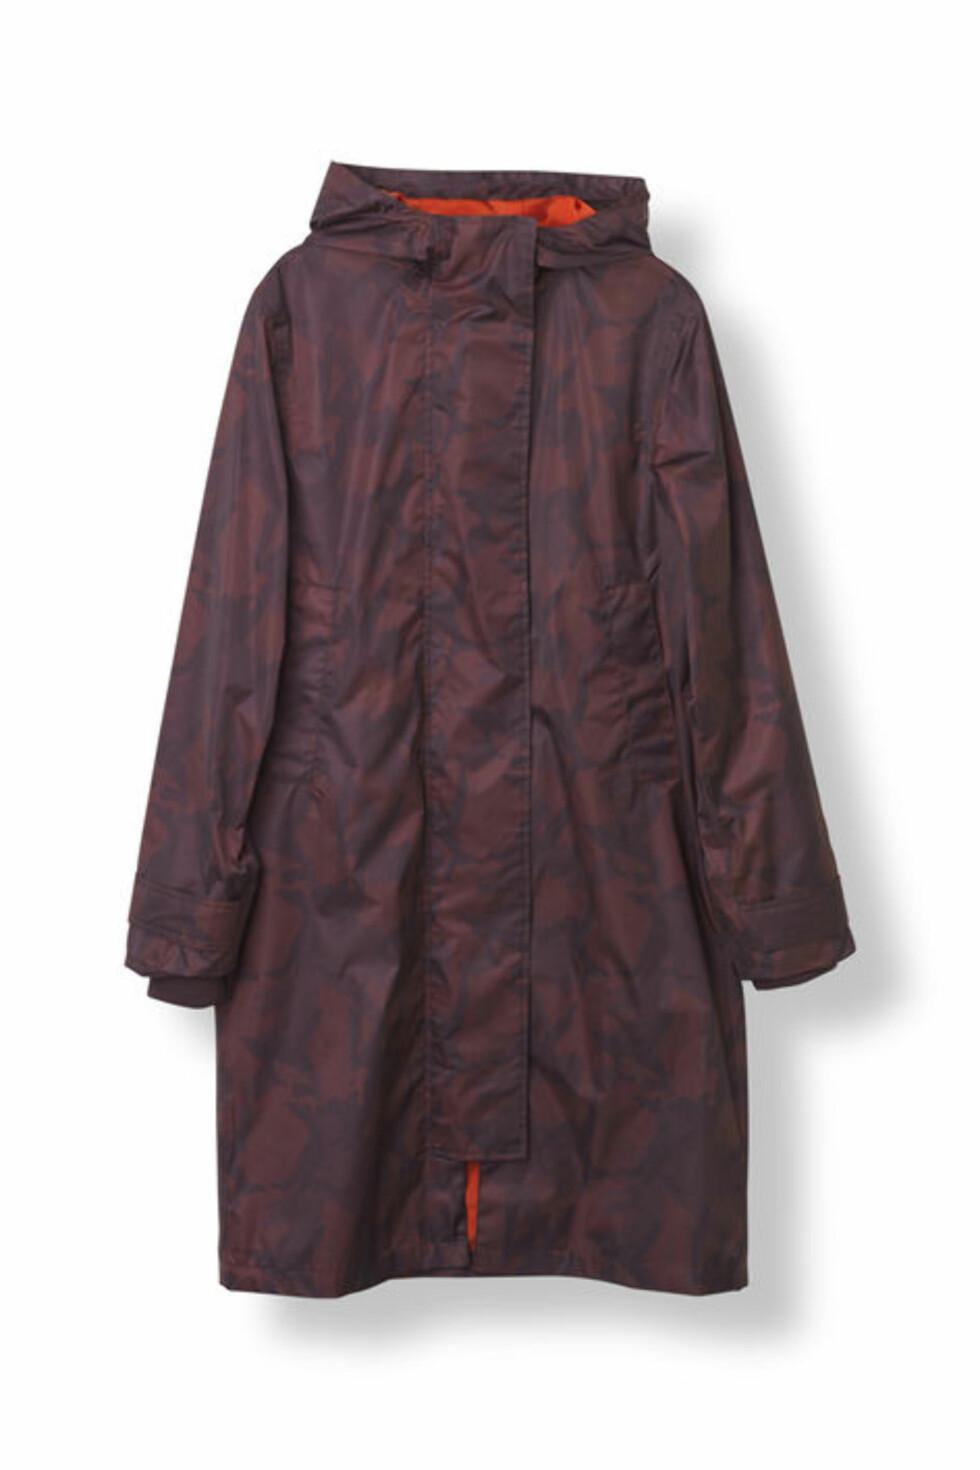 Regnjakke fra Ganni | kr 3499 | http://www.ganni.com/en/vandalia-rain-coat/F1960.html?dwvar_F1960_color=Decadent%20Chocolate